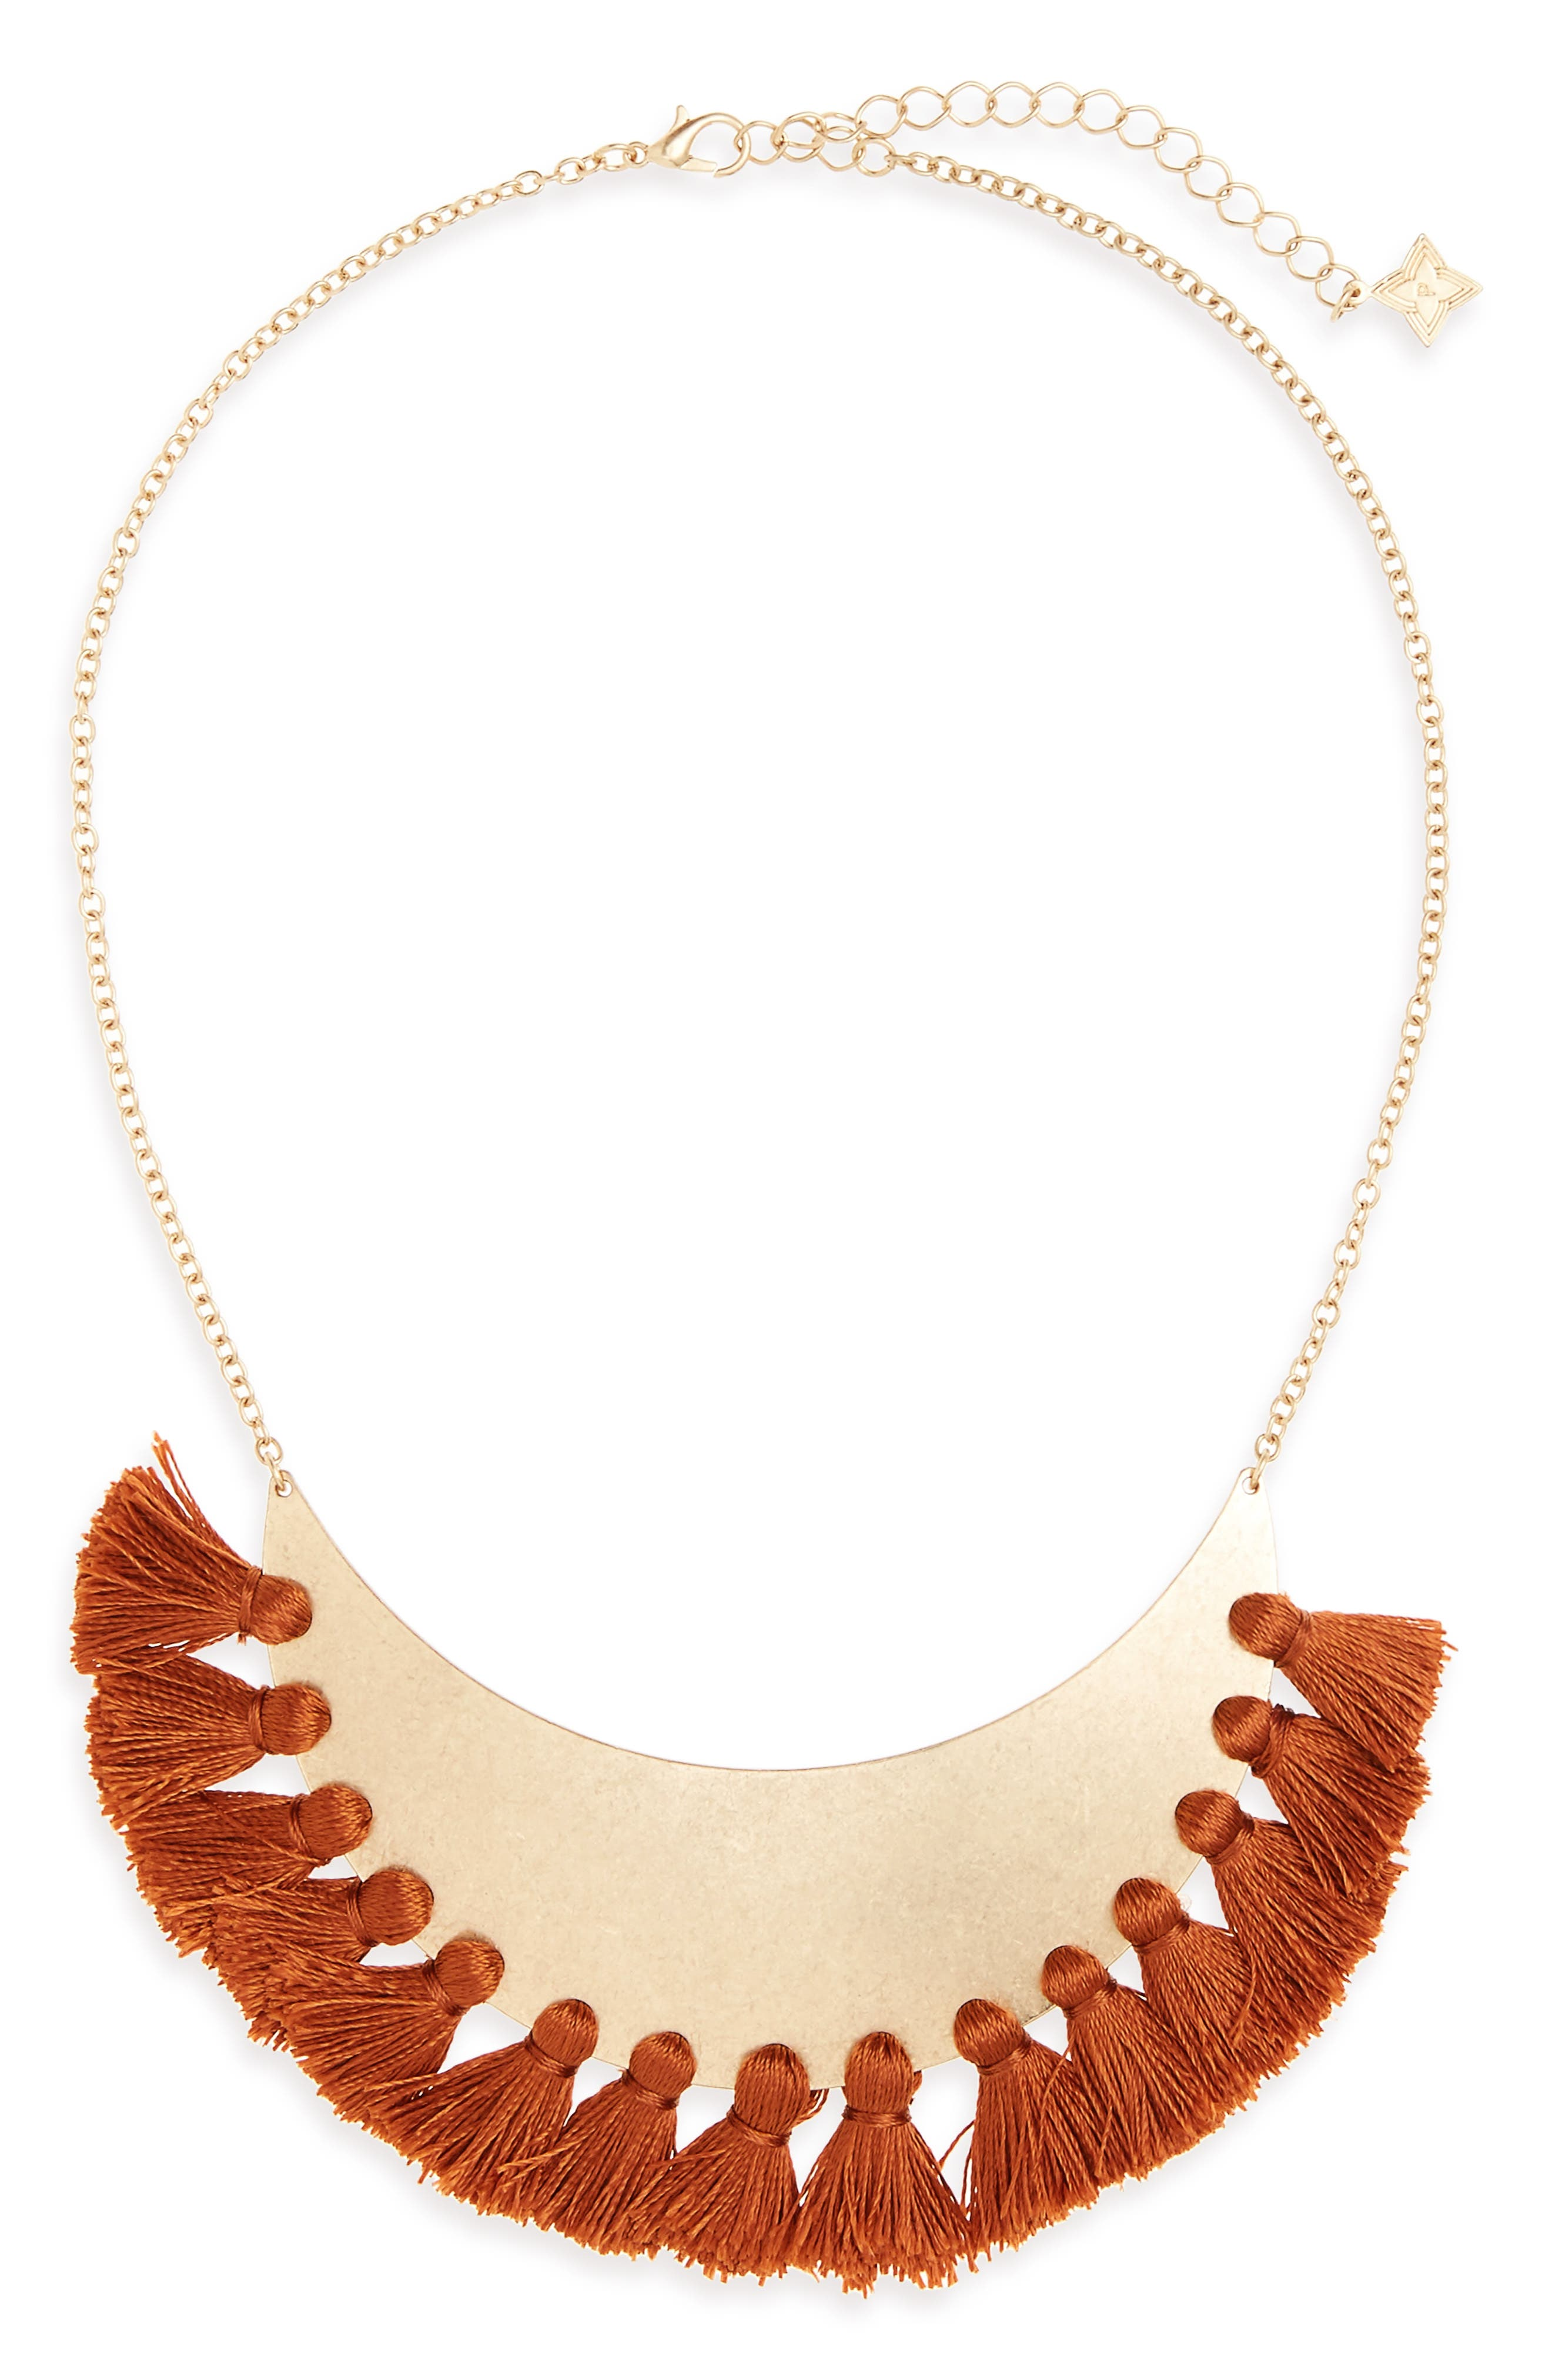 Main Image - Panacea Tassel Bib Necklace